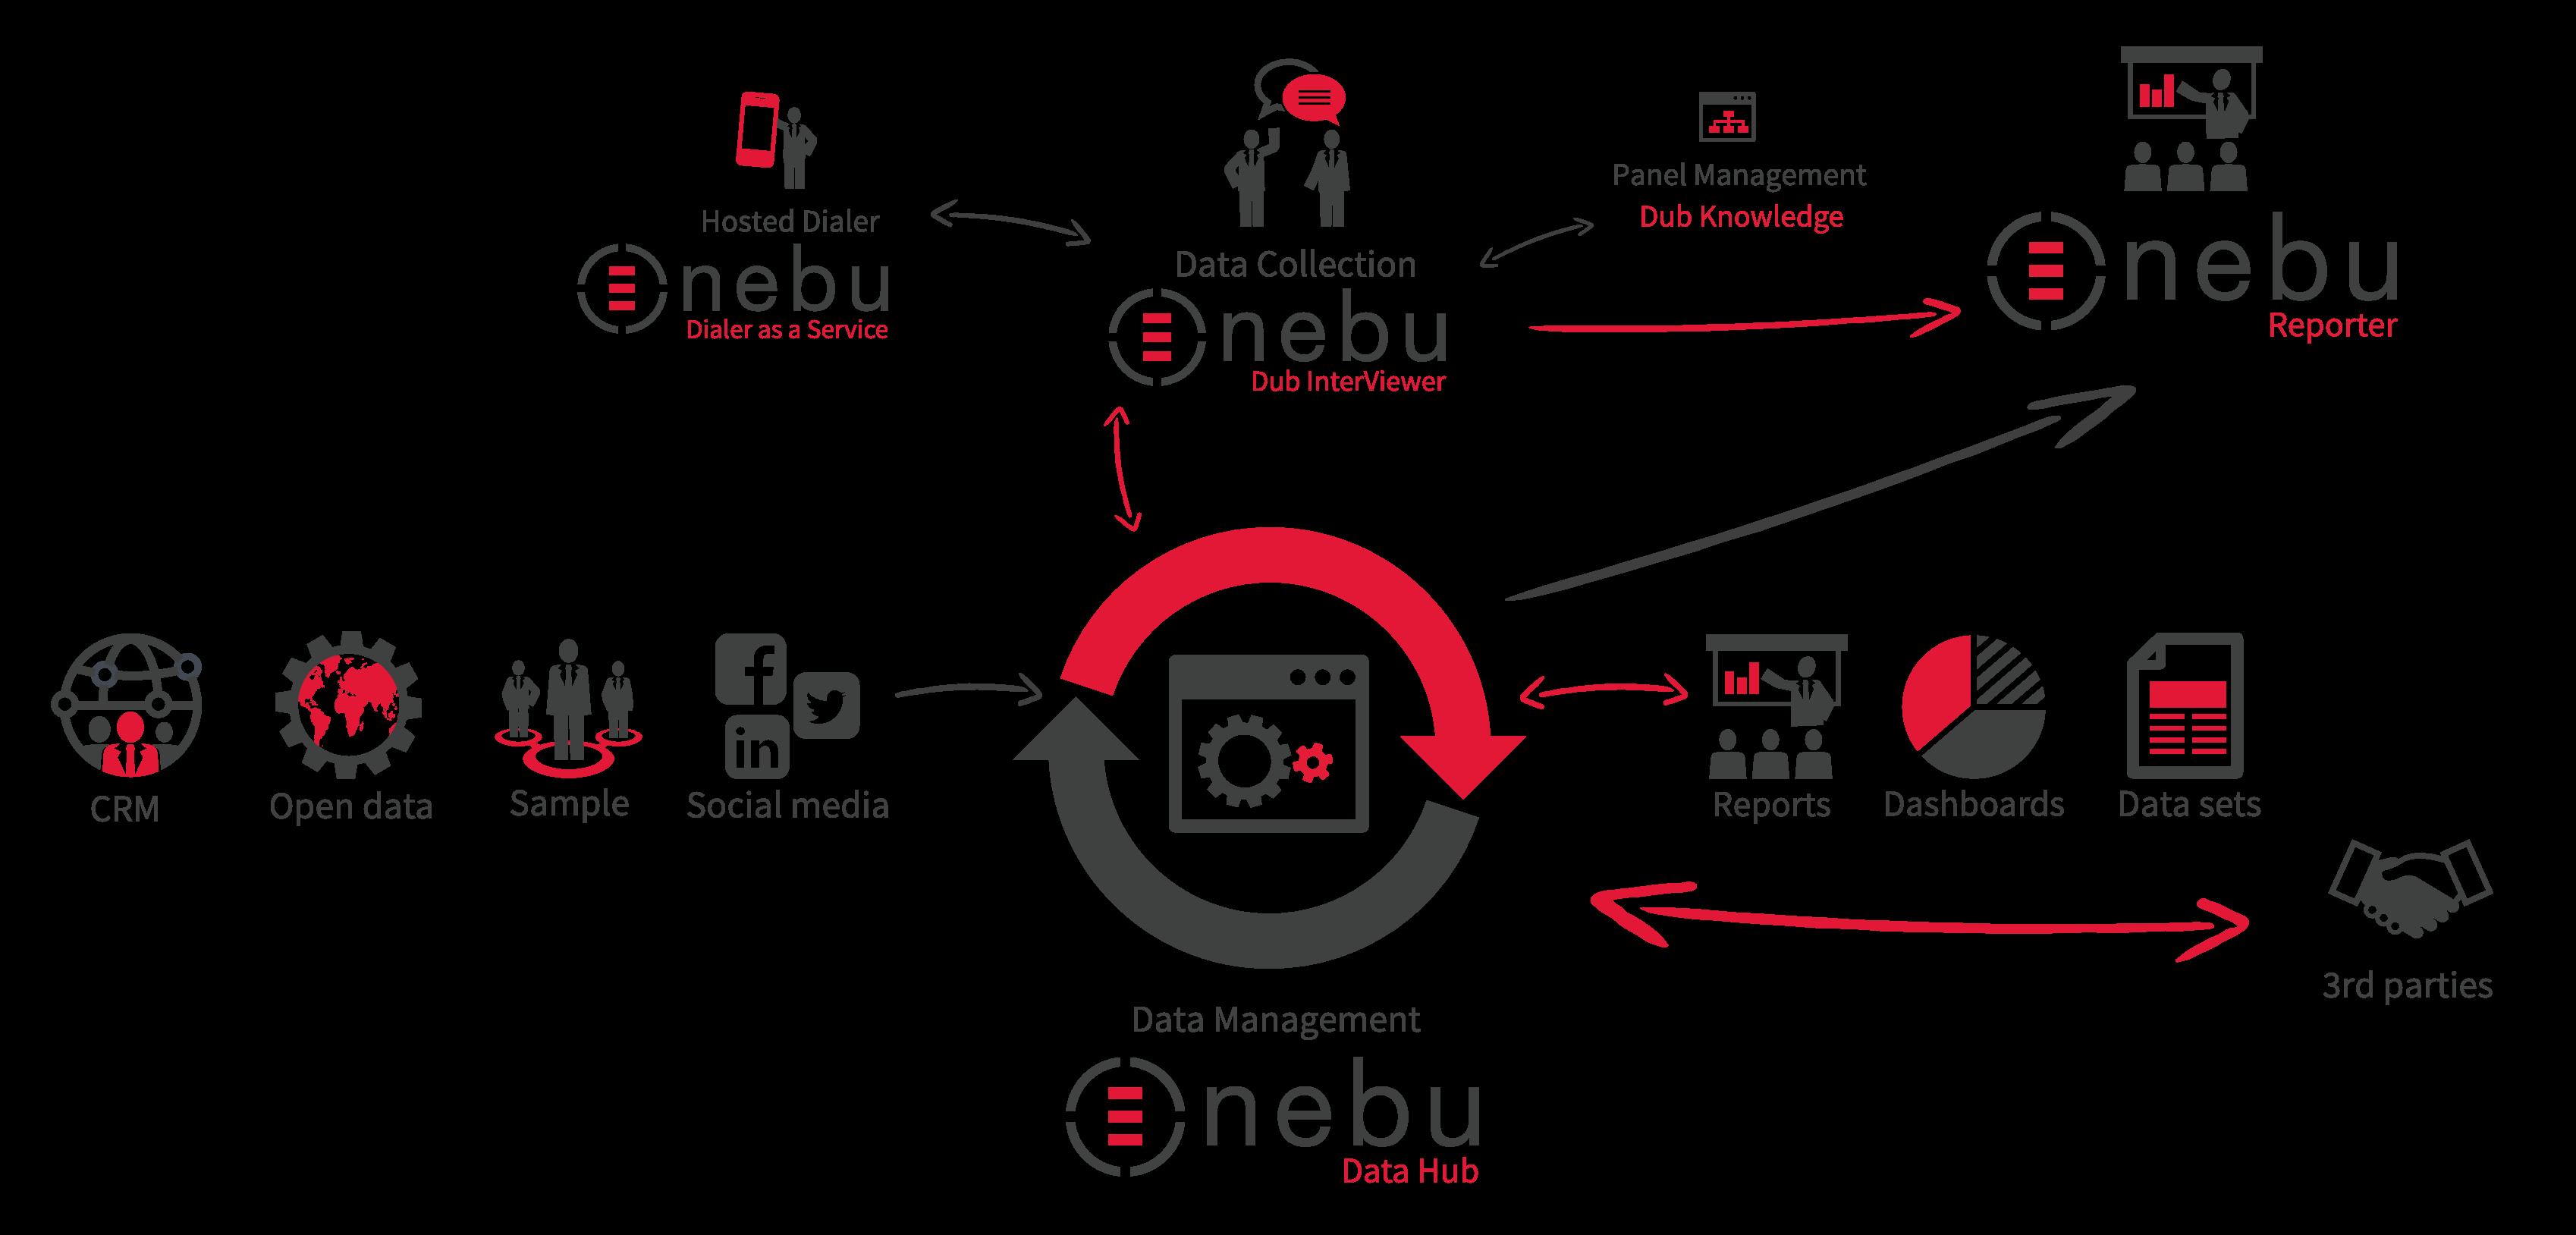 NebuProductsInfographic_CMU+NR - Nebu-PDF-2017-6v2.png